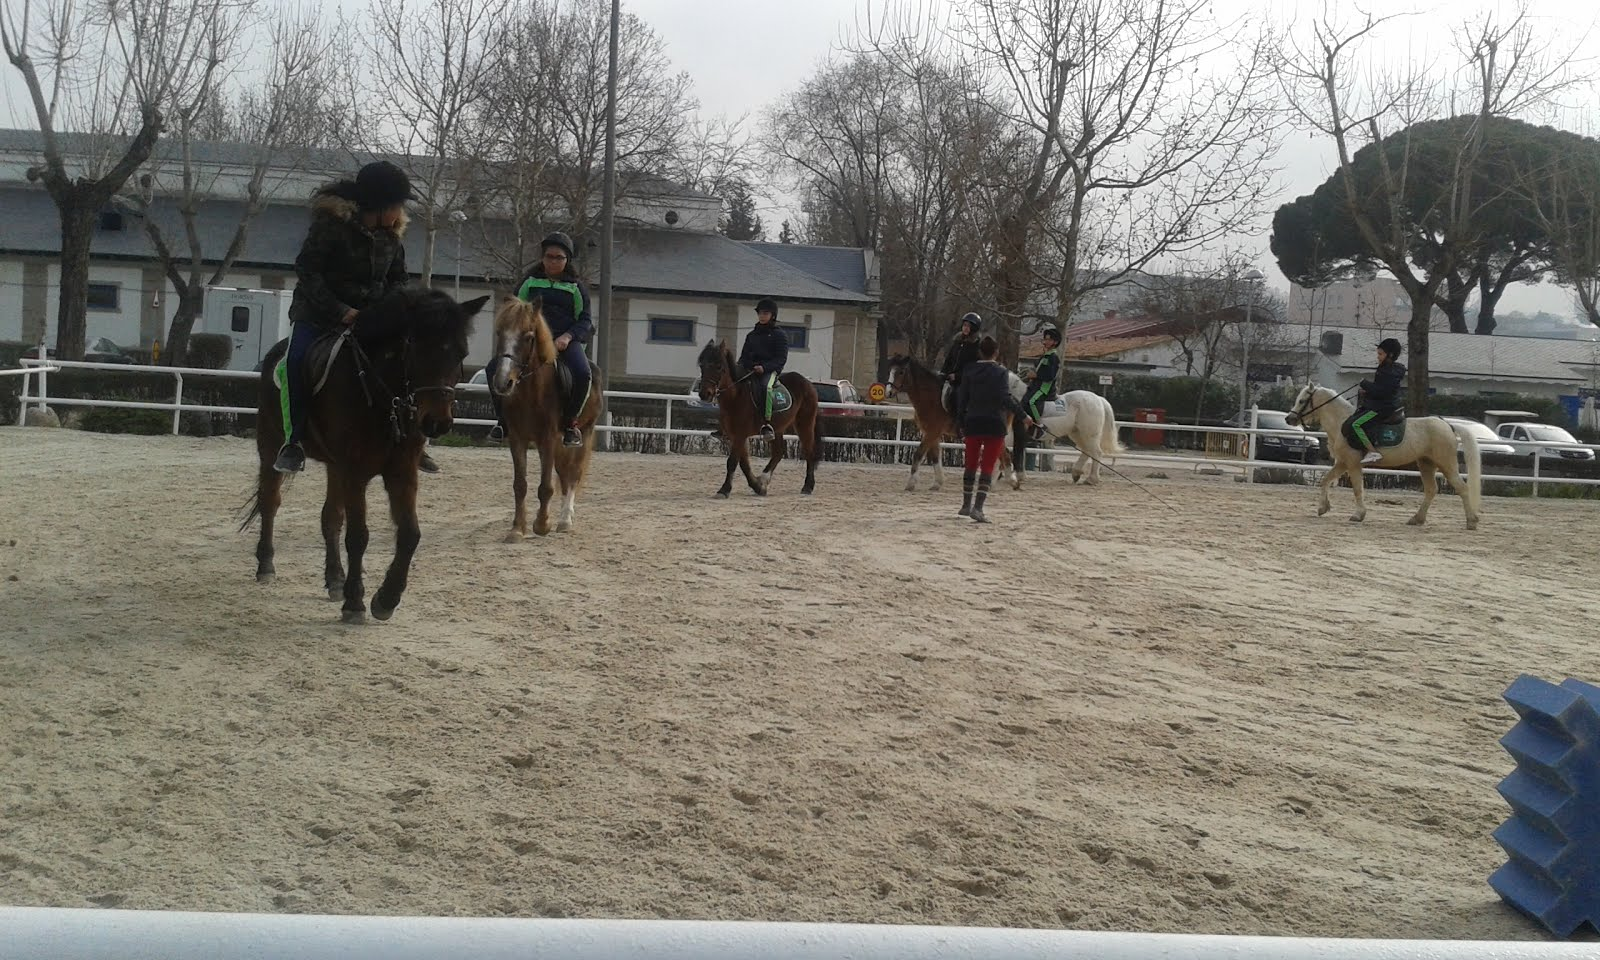 Blog Del Ceip Azor N De Madrid Equitaci N En El Club De